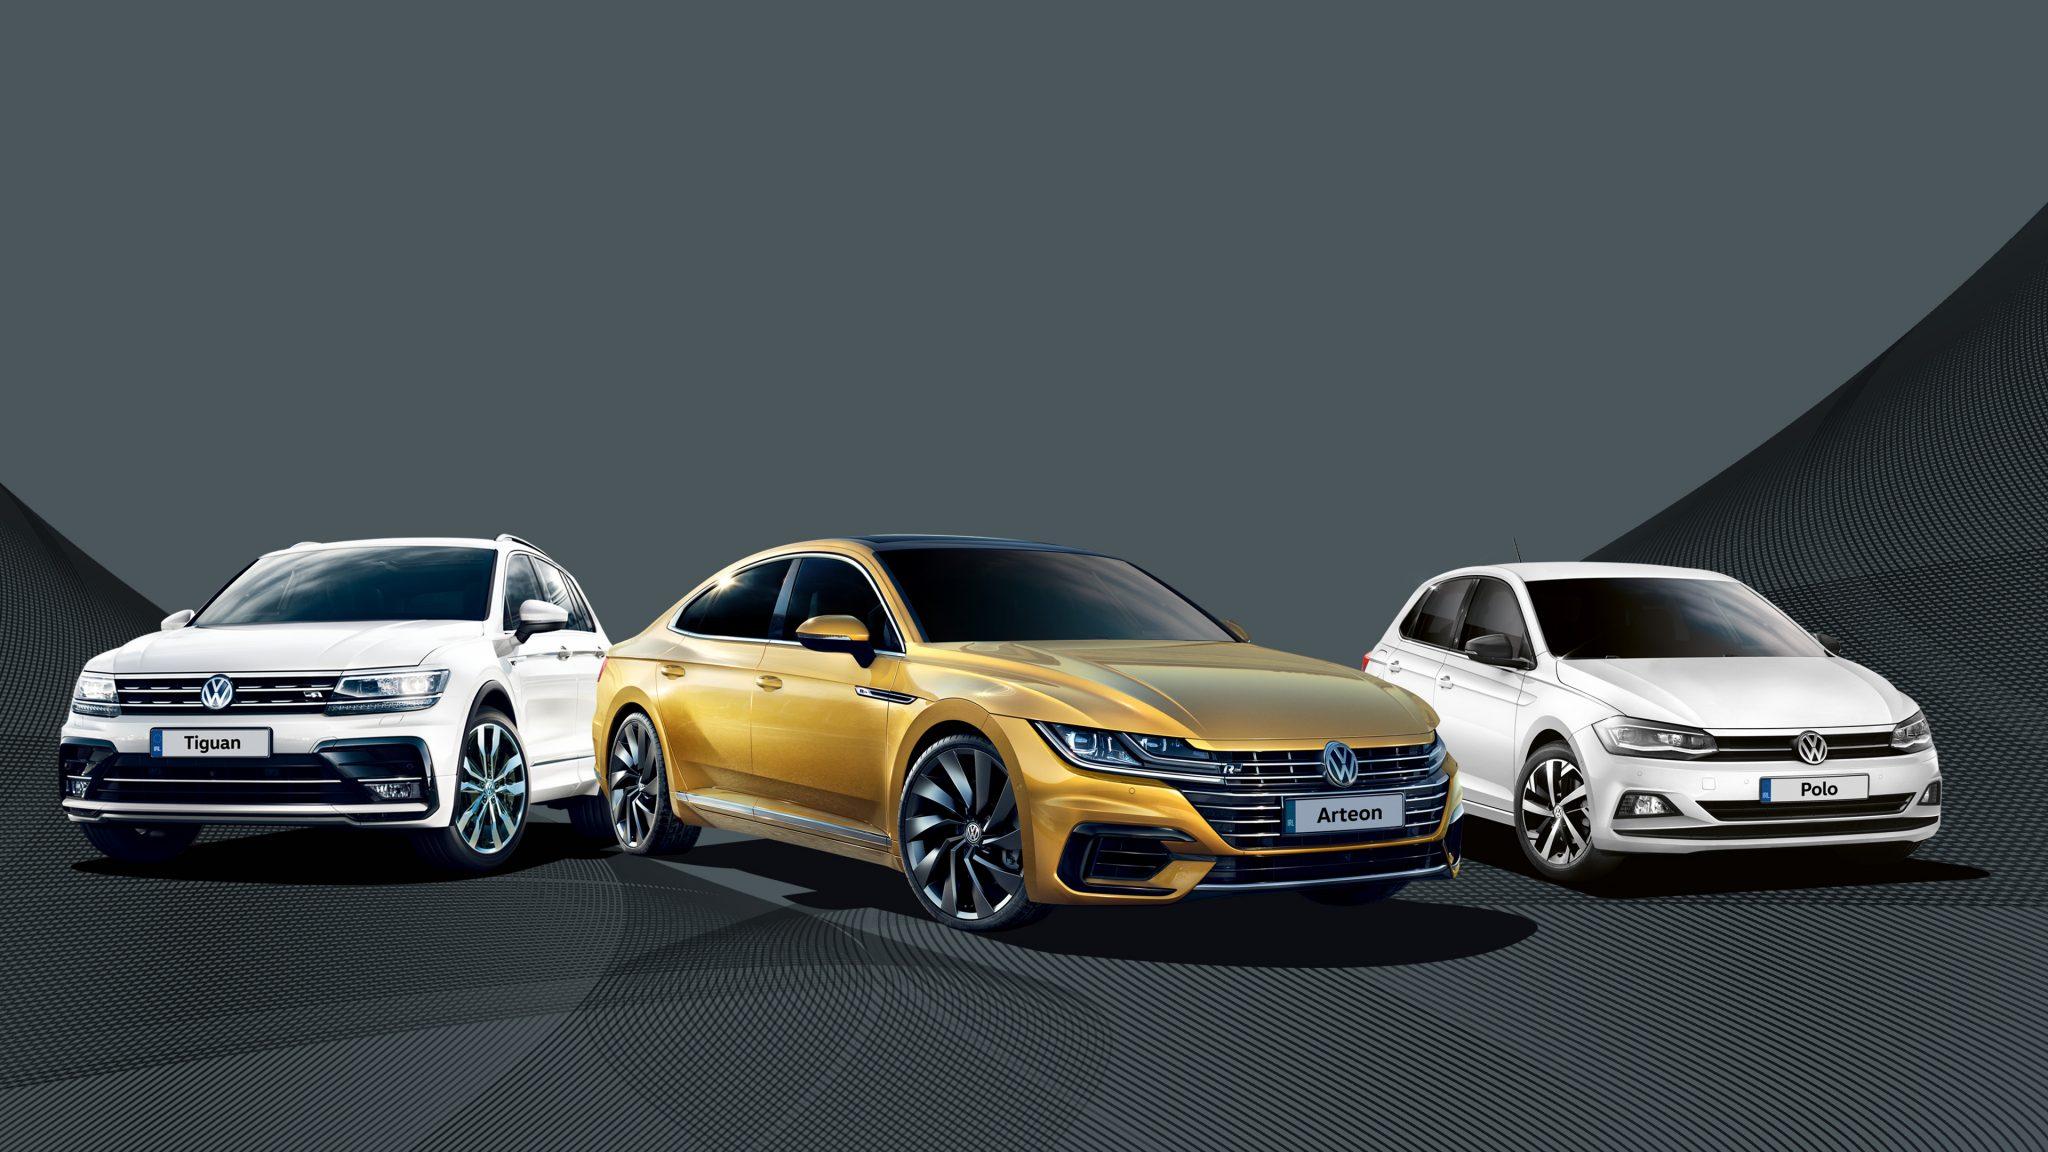 MADE IN RWANDA? UP TO 5,000 CARS TO BE PRODUCED IN RWANDA PER YEAR